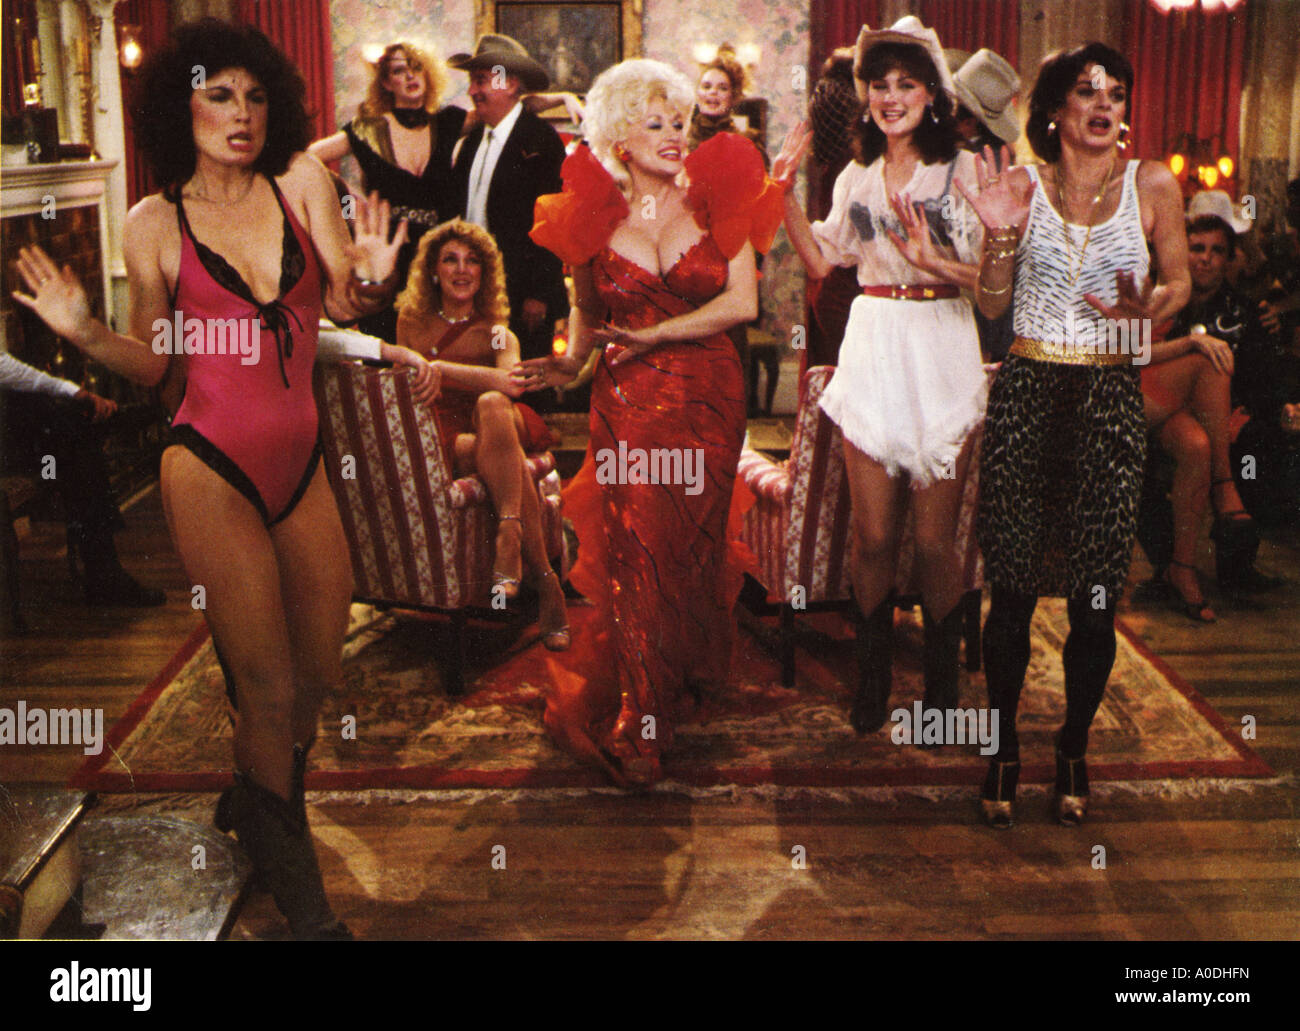 Whorehouse Texas Universal Film Dolly Parton Paper Doll Bar